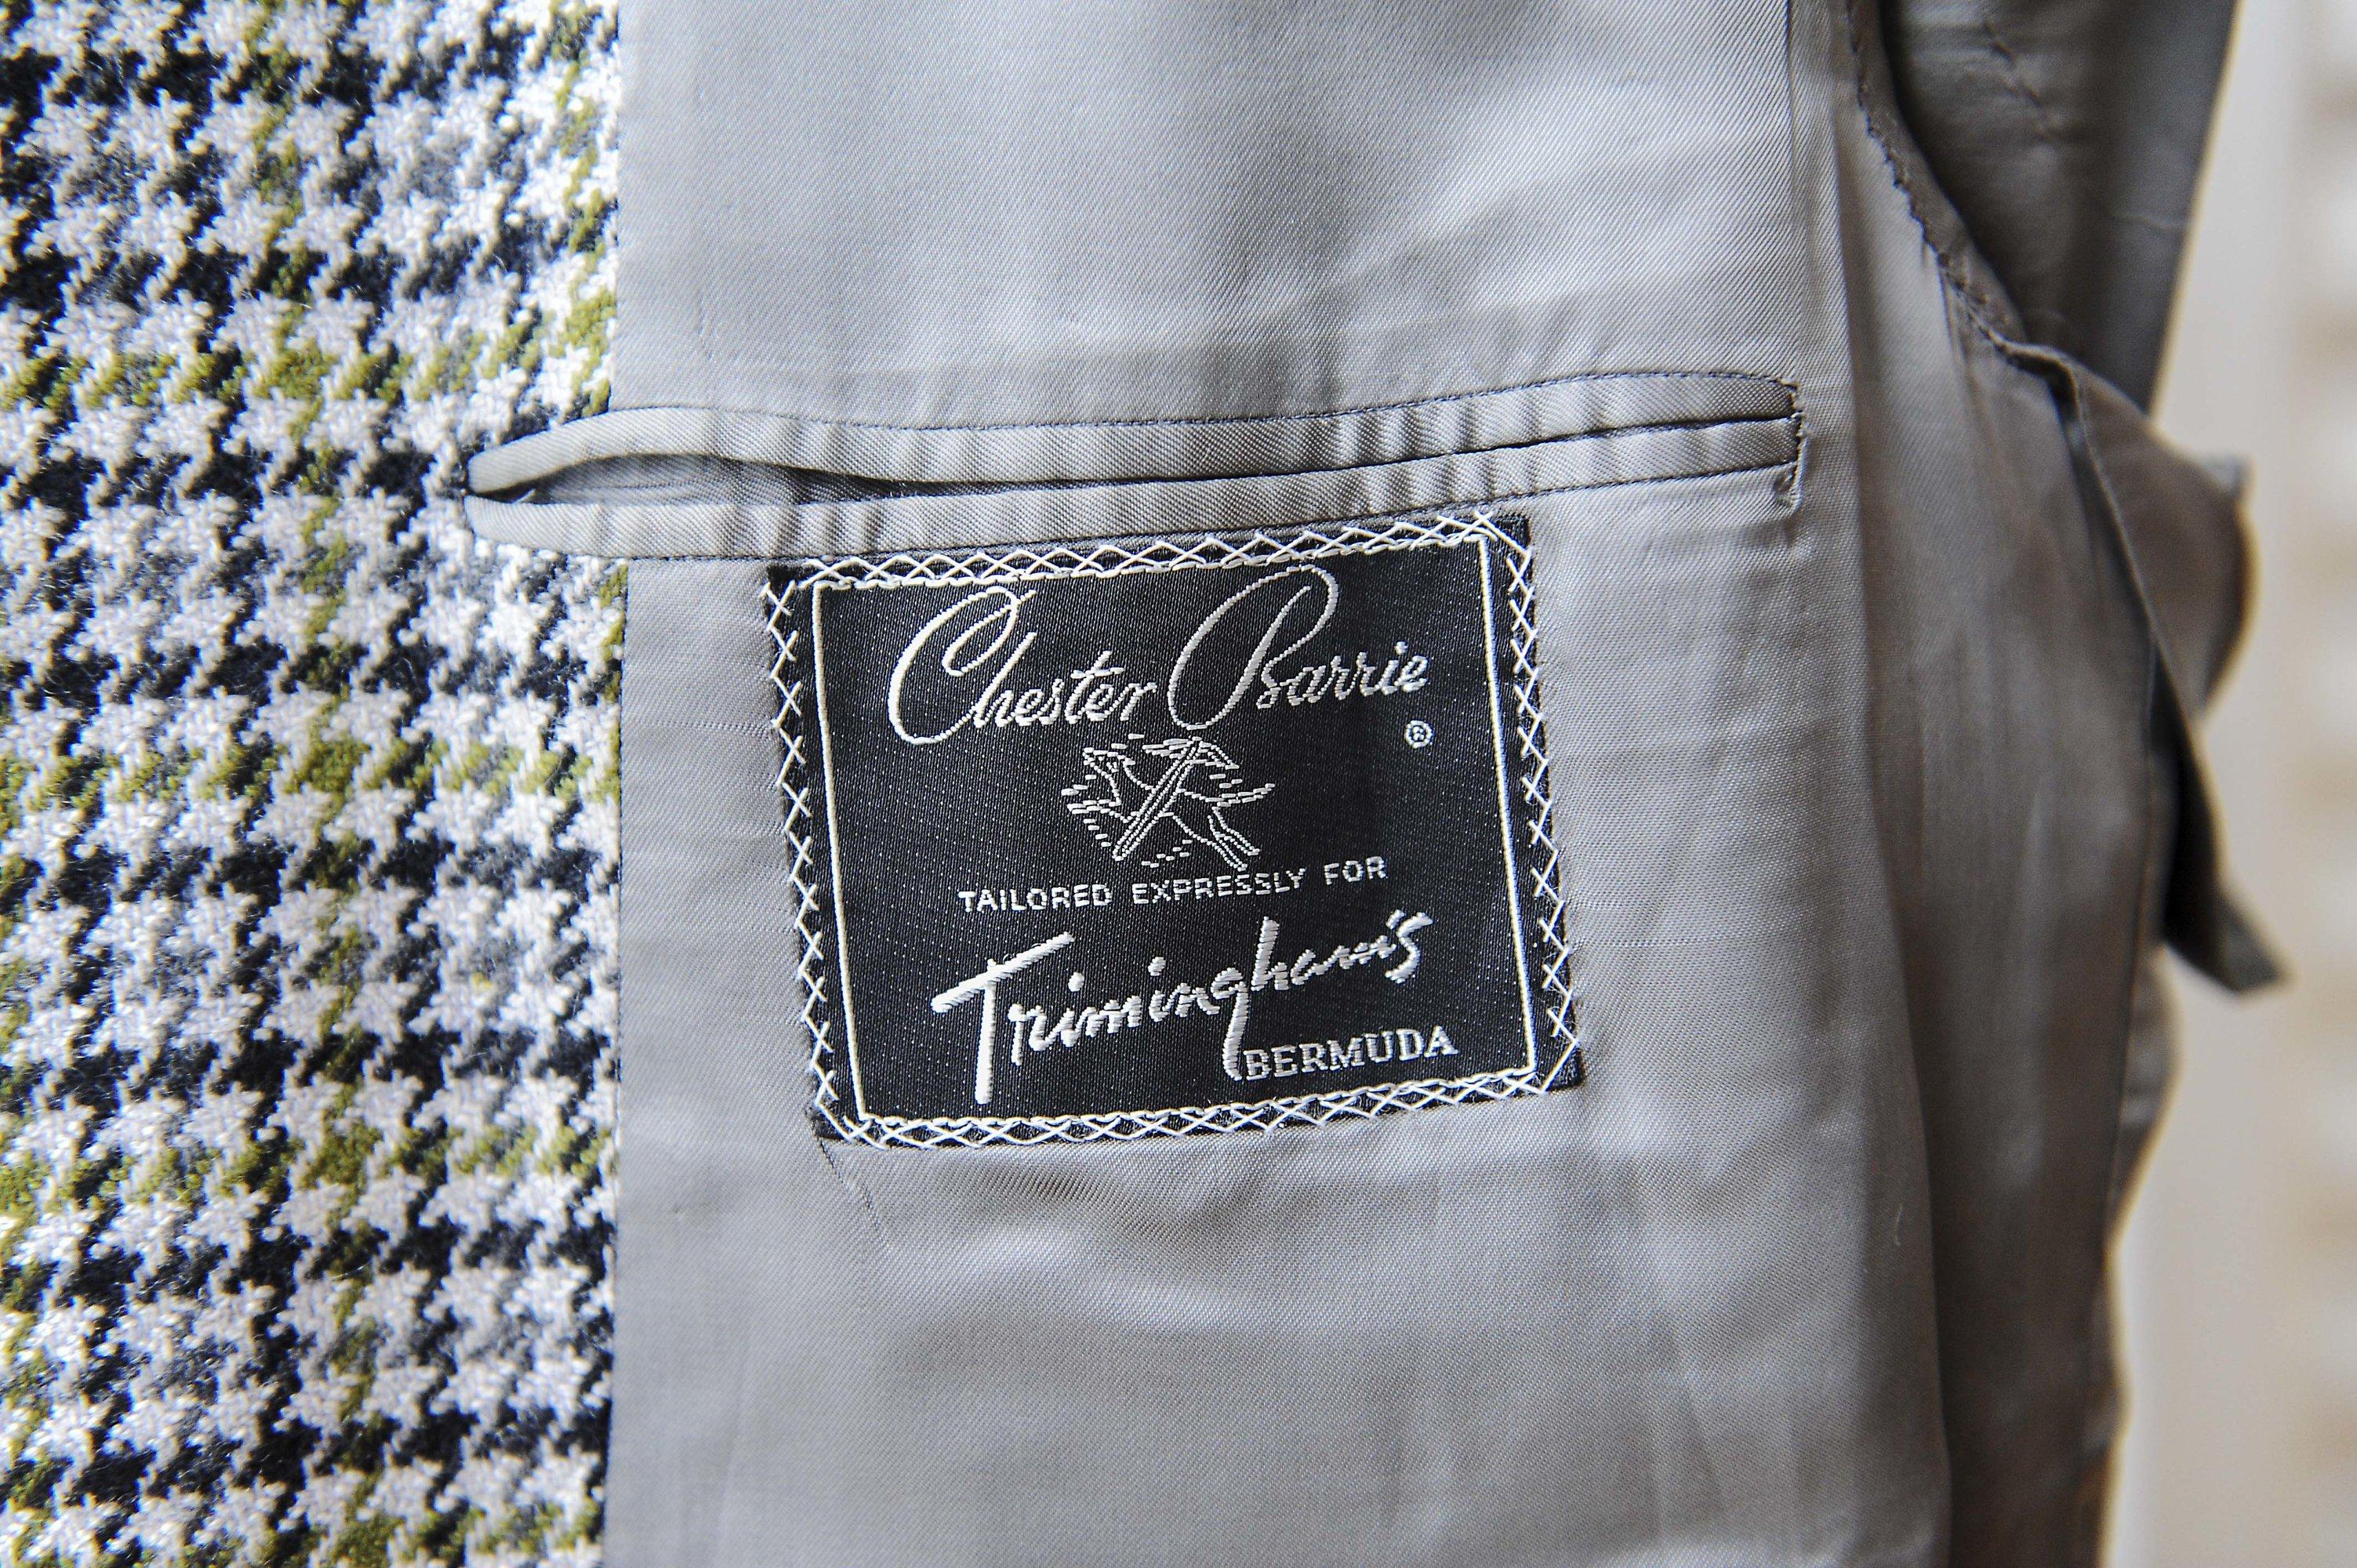 ChesterBarrie-04.jpg